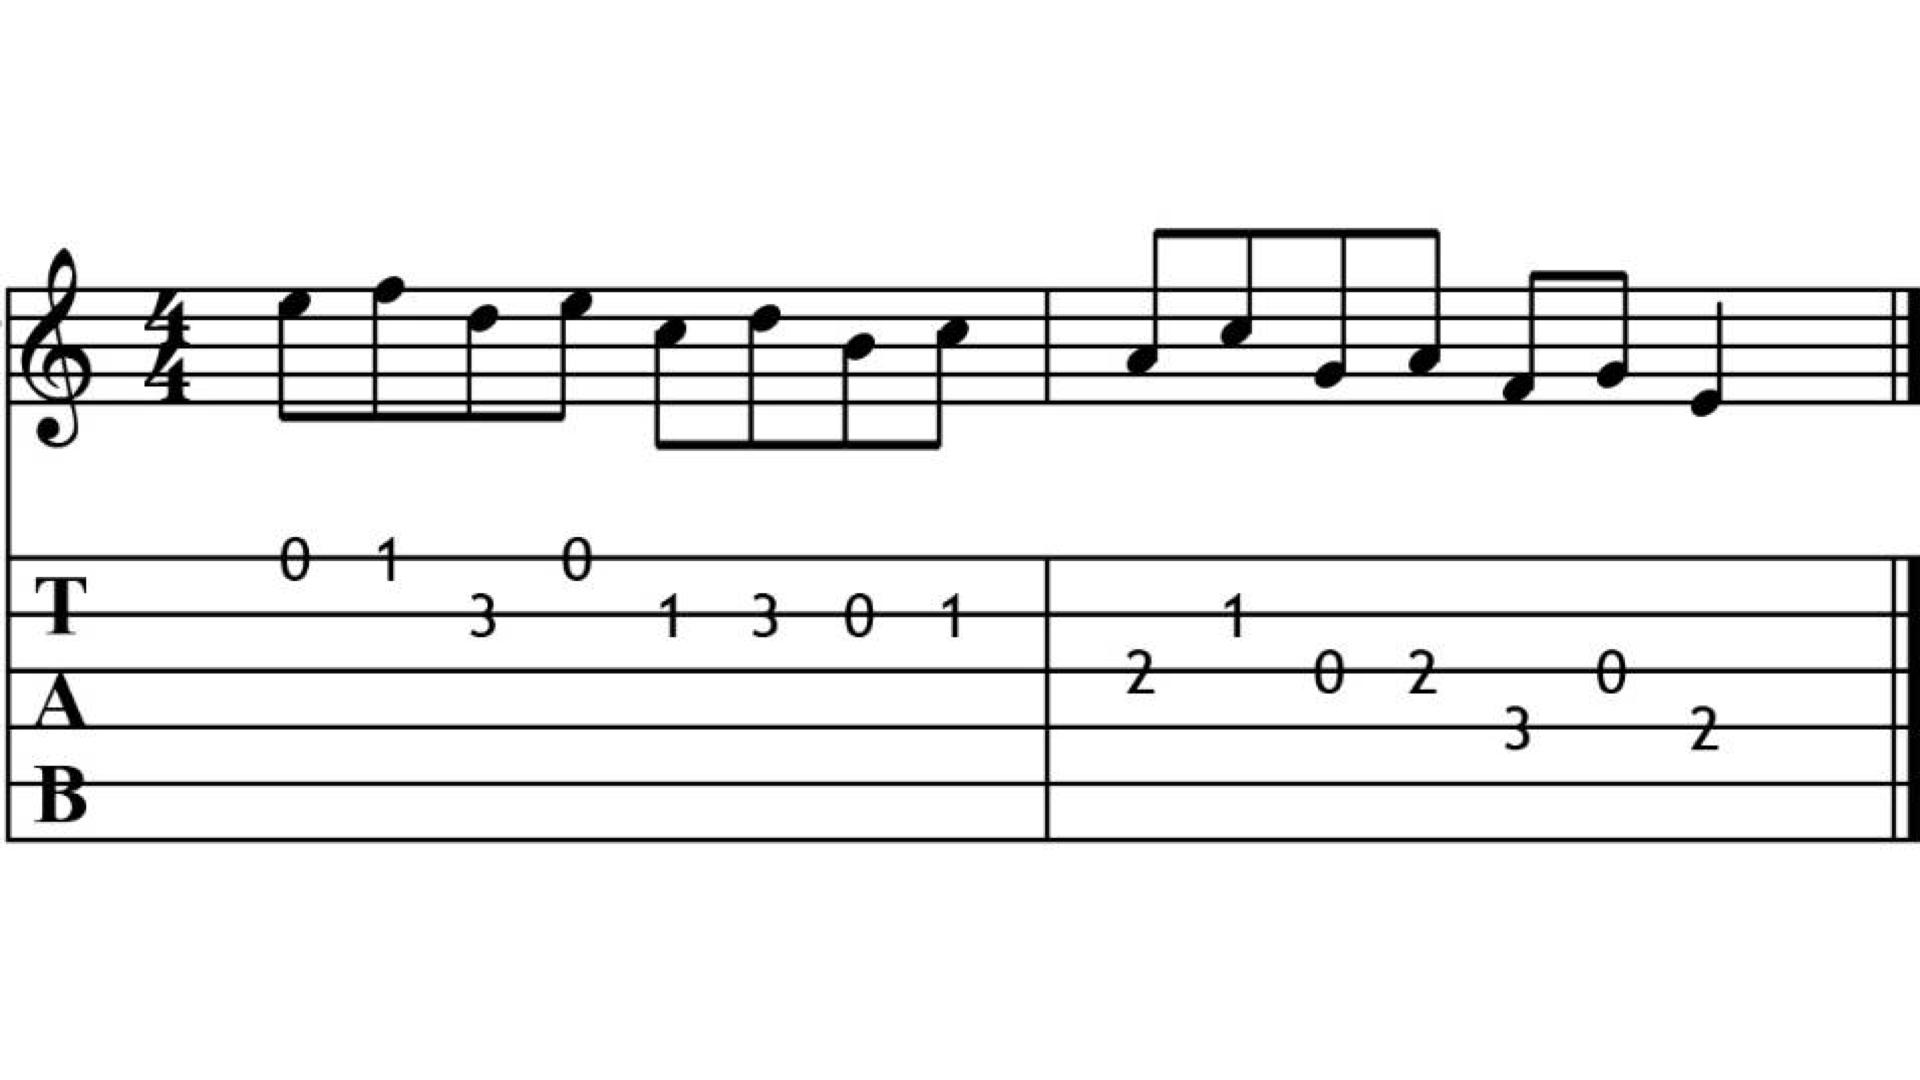 Ultimate-Guitar.com